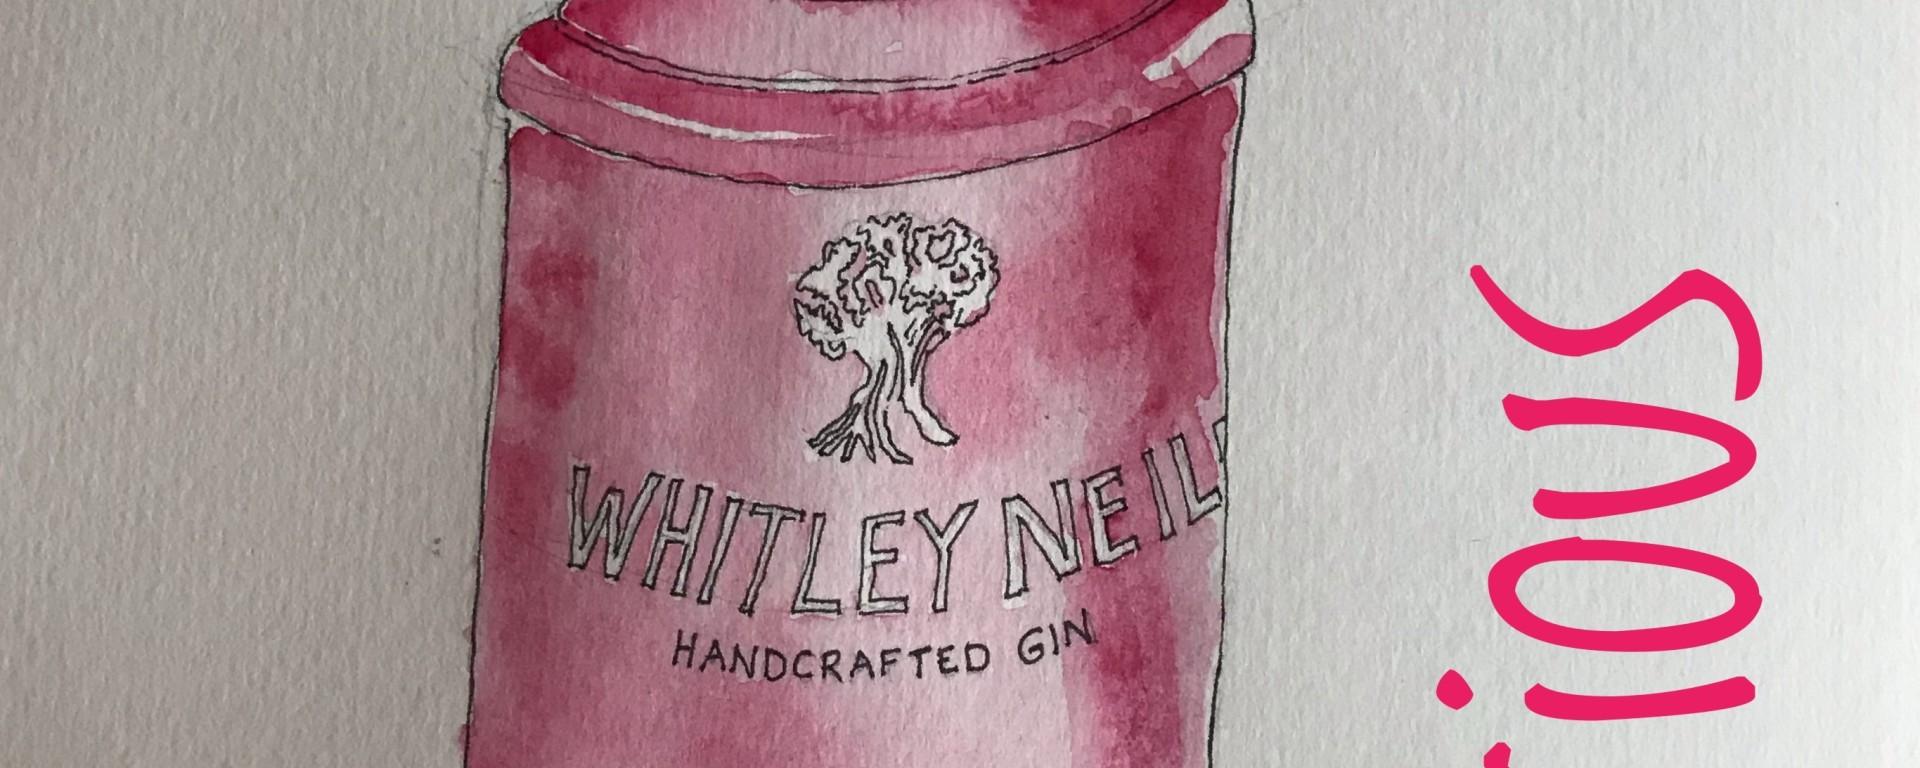 whitley-neill-gin